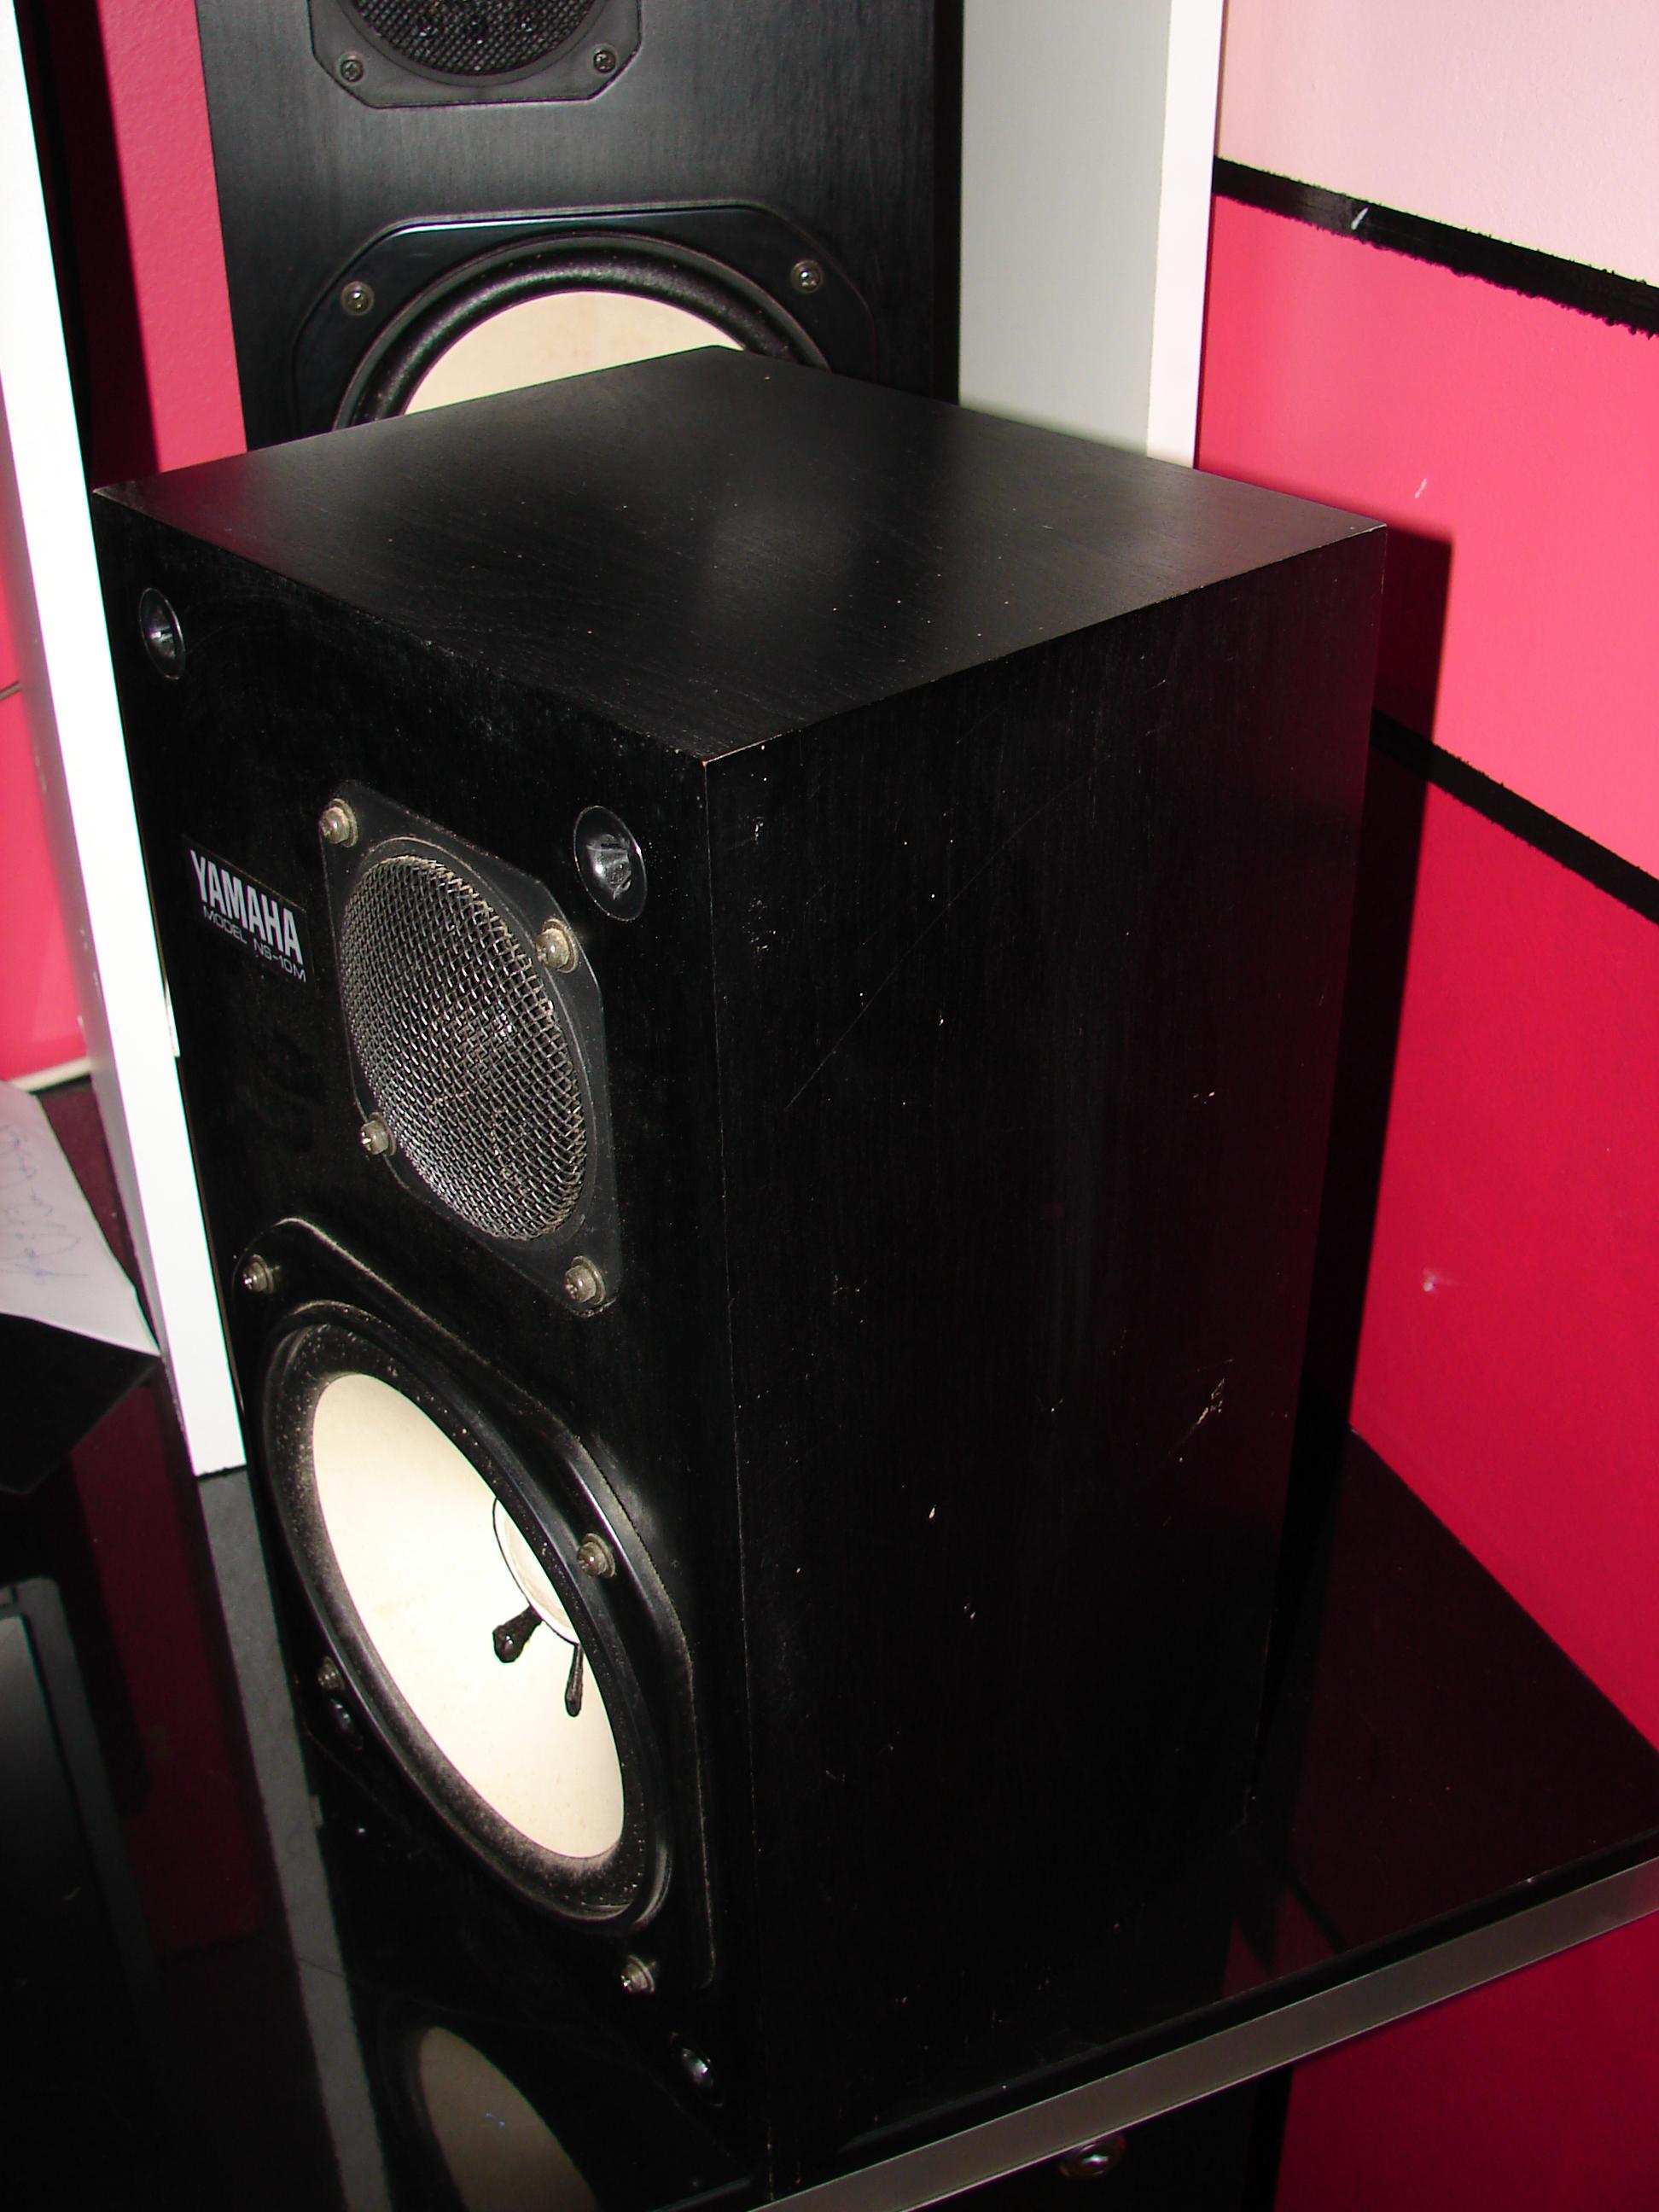 yamaha ns 10m studio image 2082049 audiofanzine. Black Bedroom Furniture Sets. Home Design Ideas